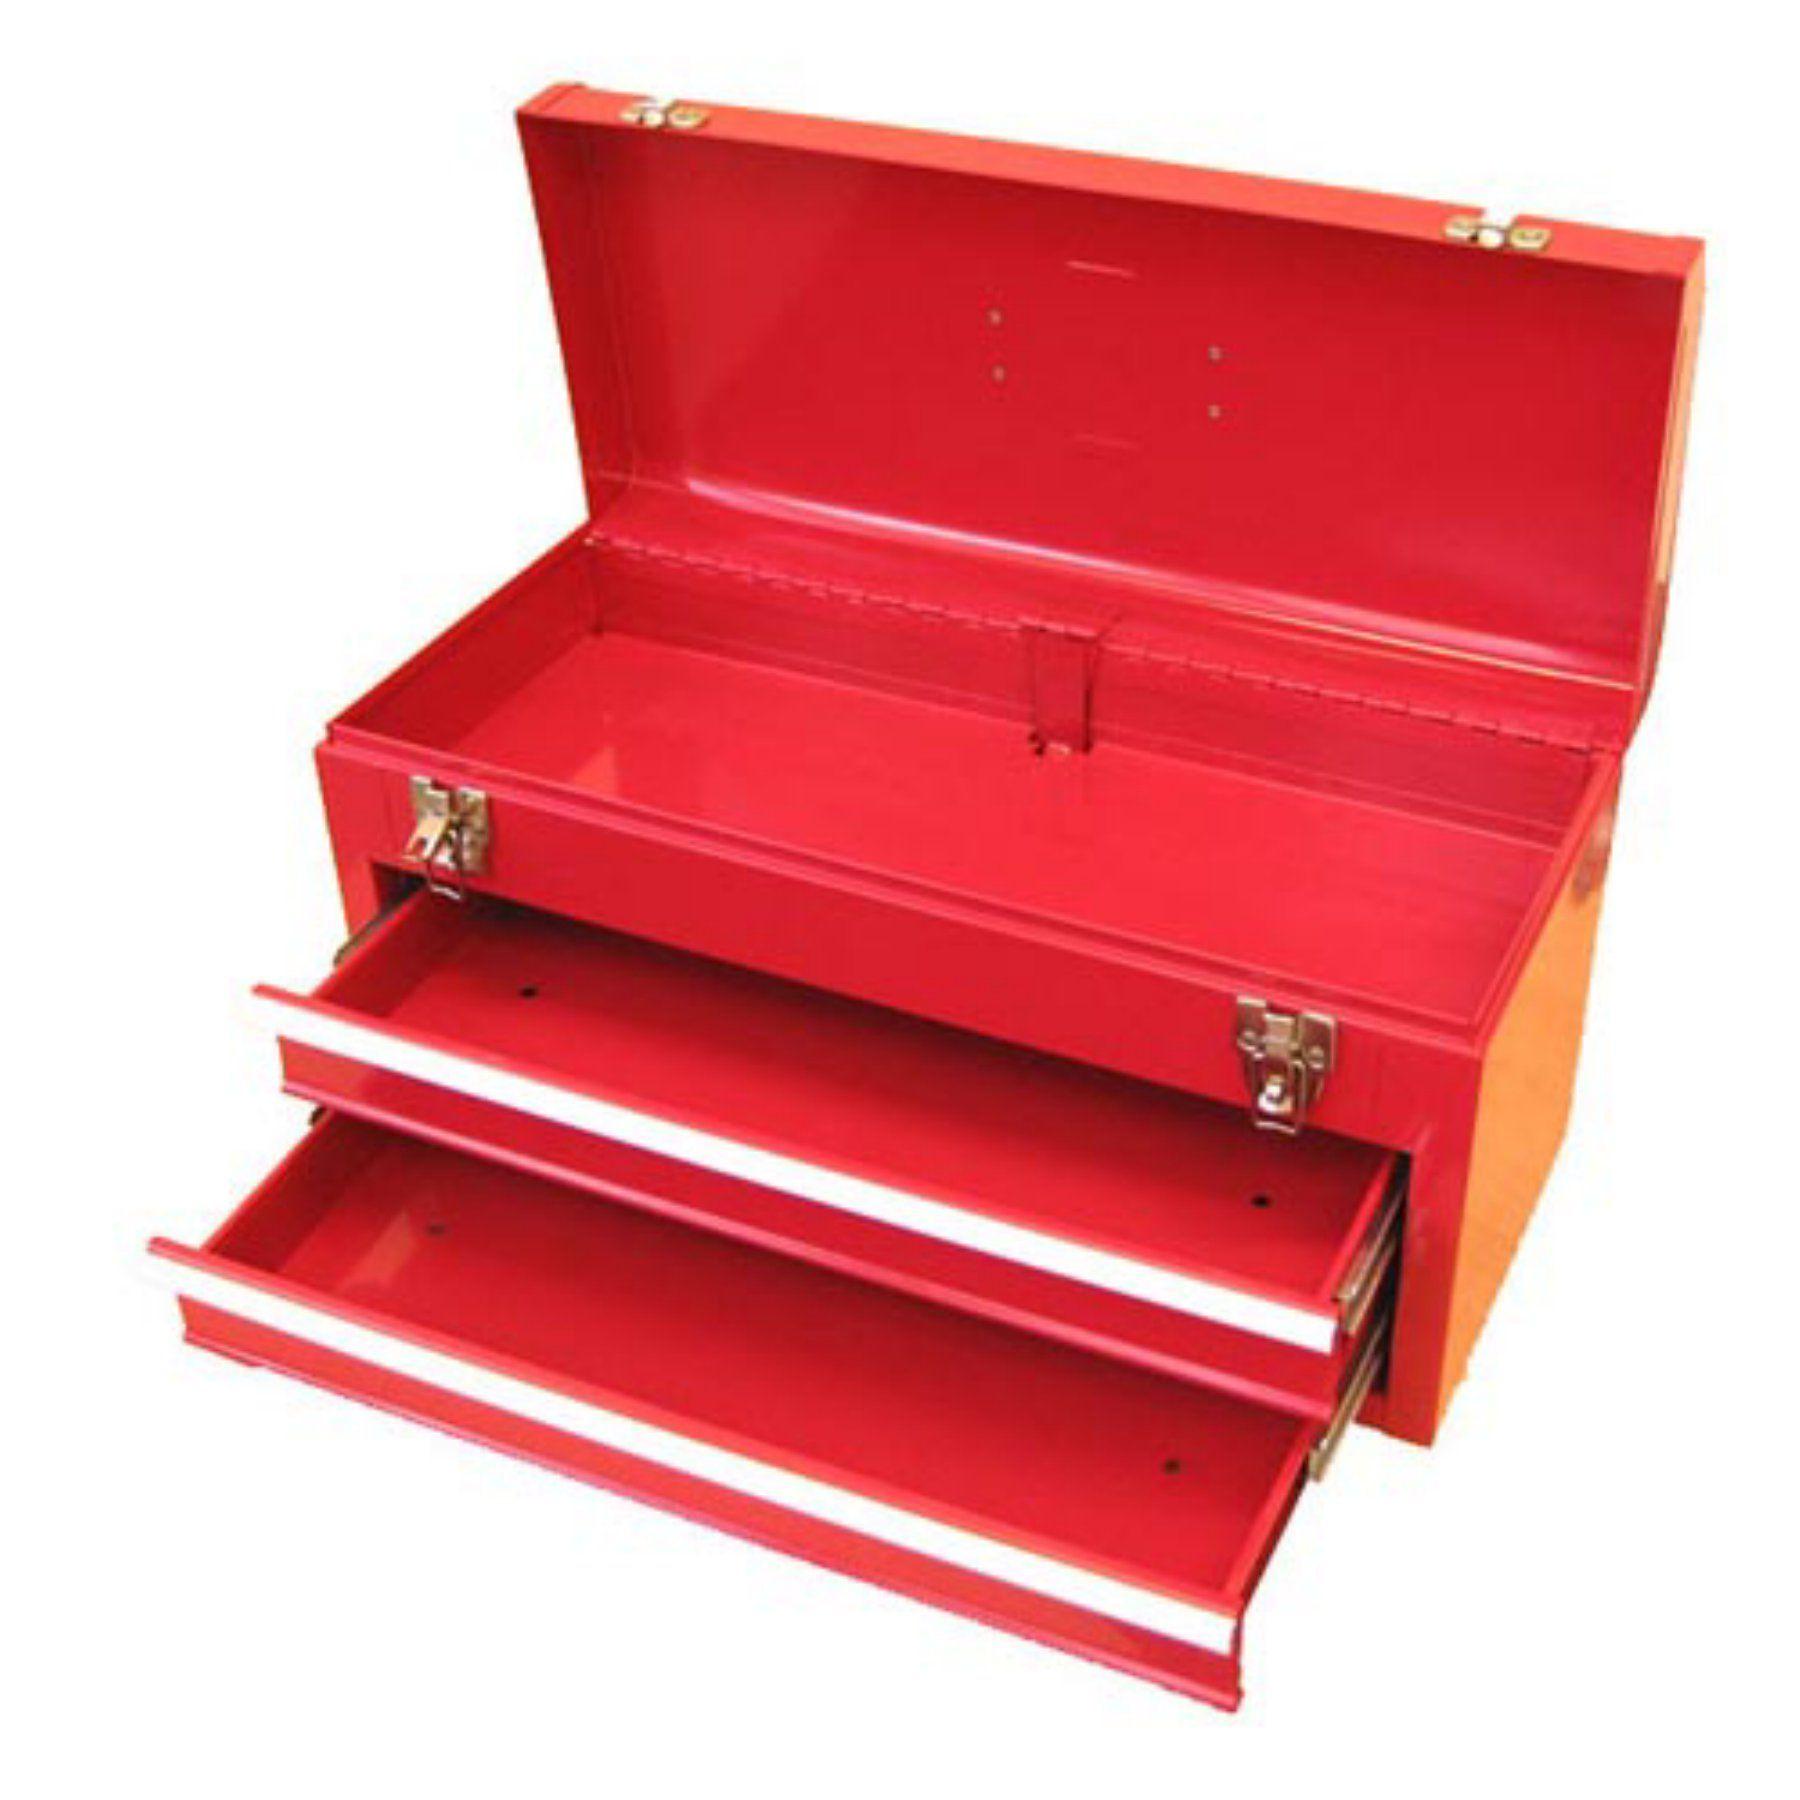 Greenlee 1230 Welders Box 30-Inch by 12-Inch by 16-Inch